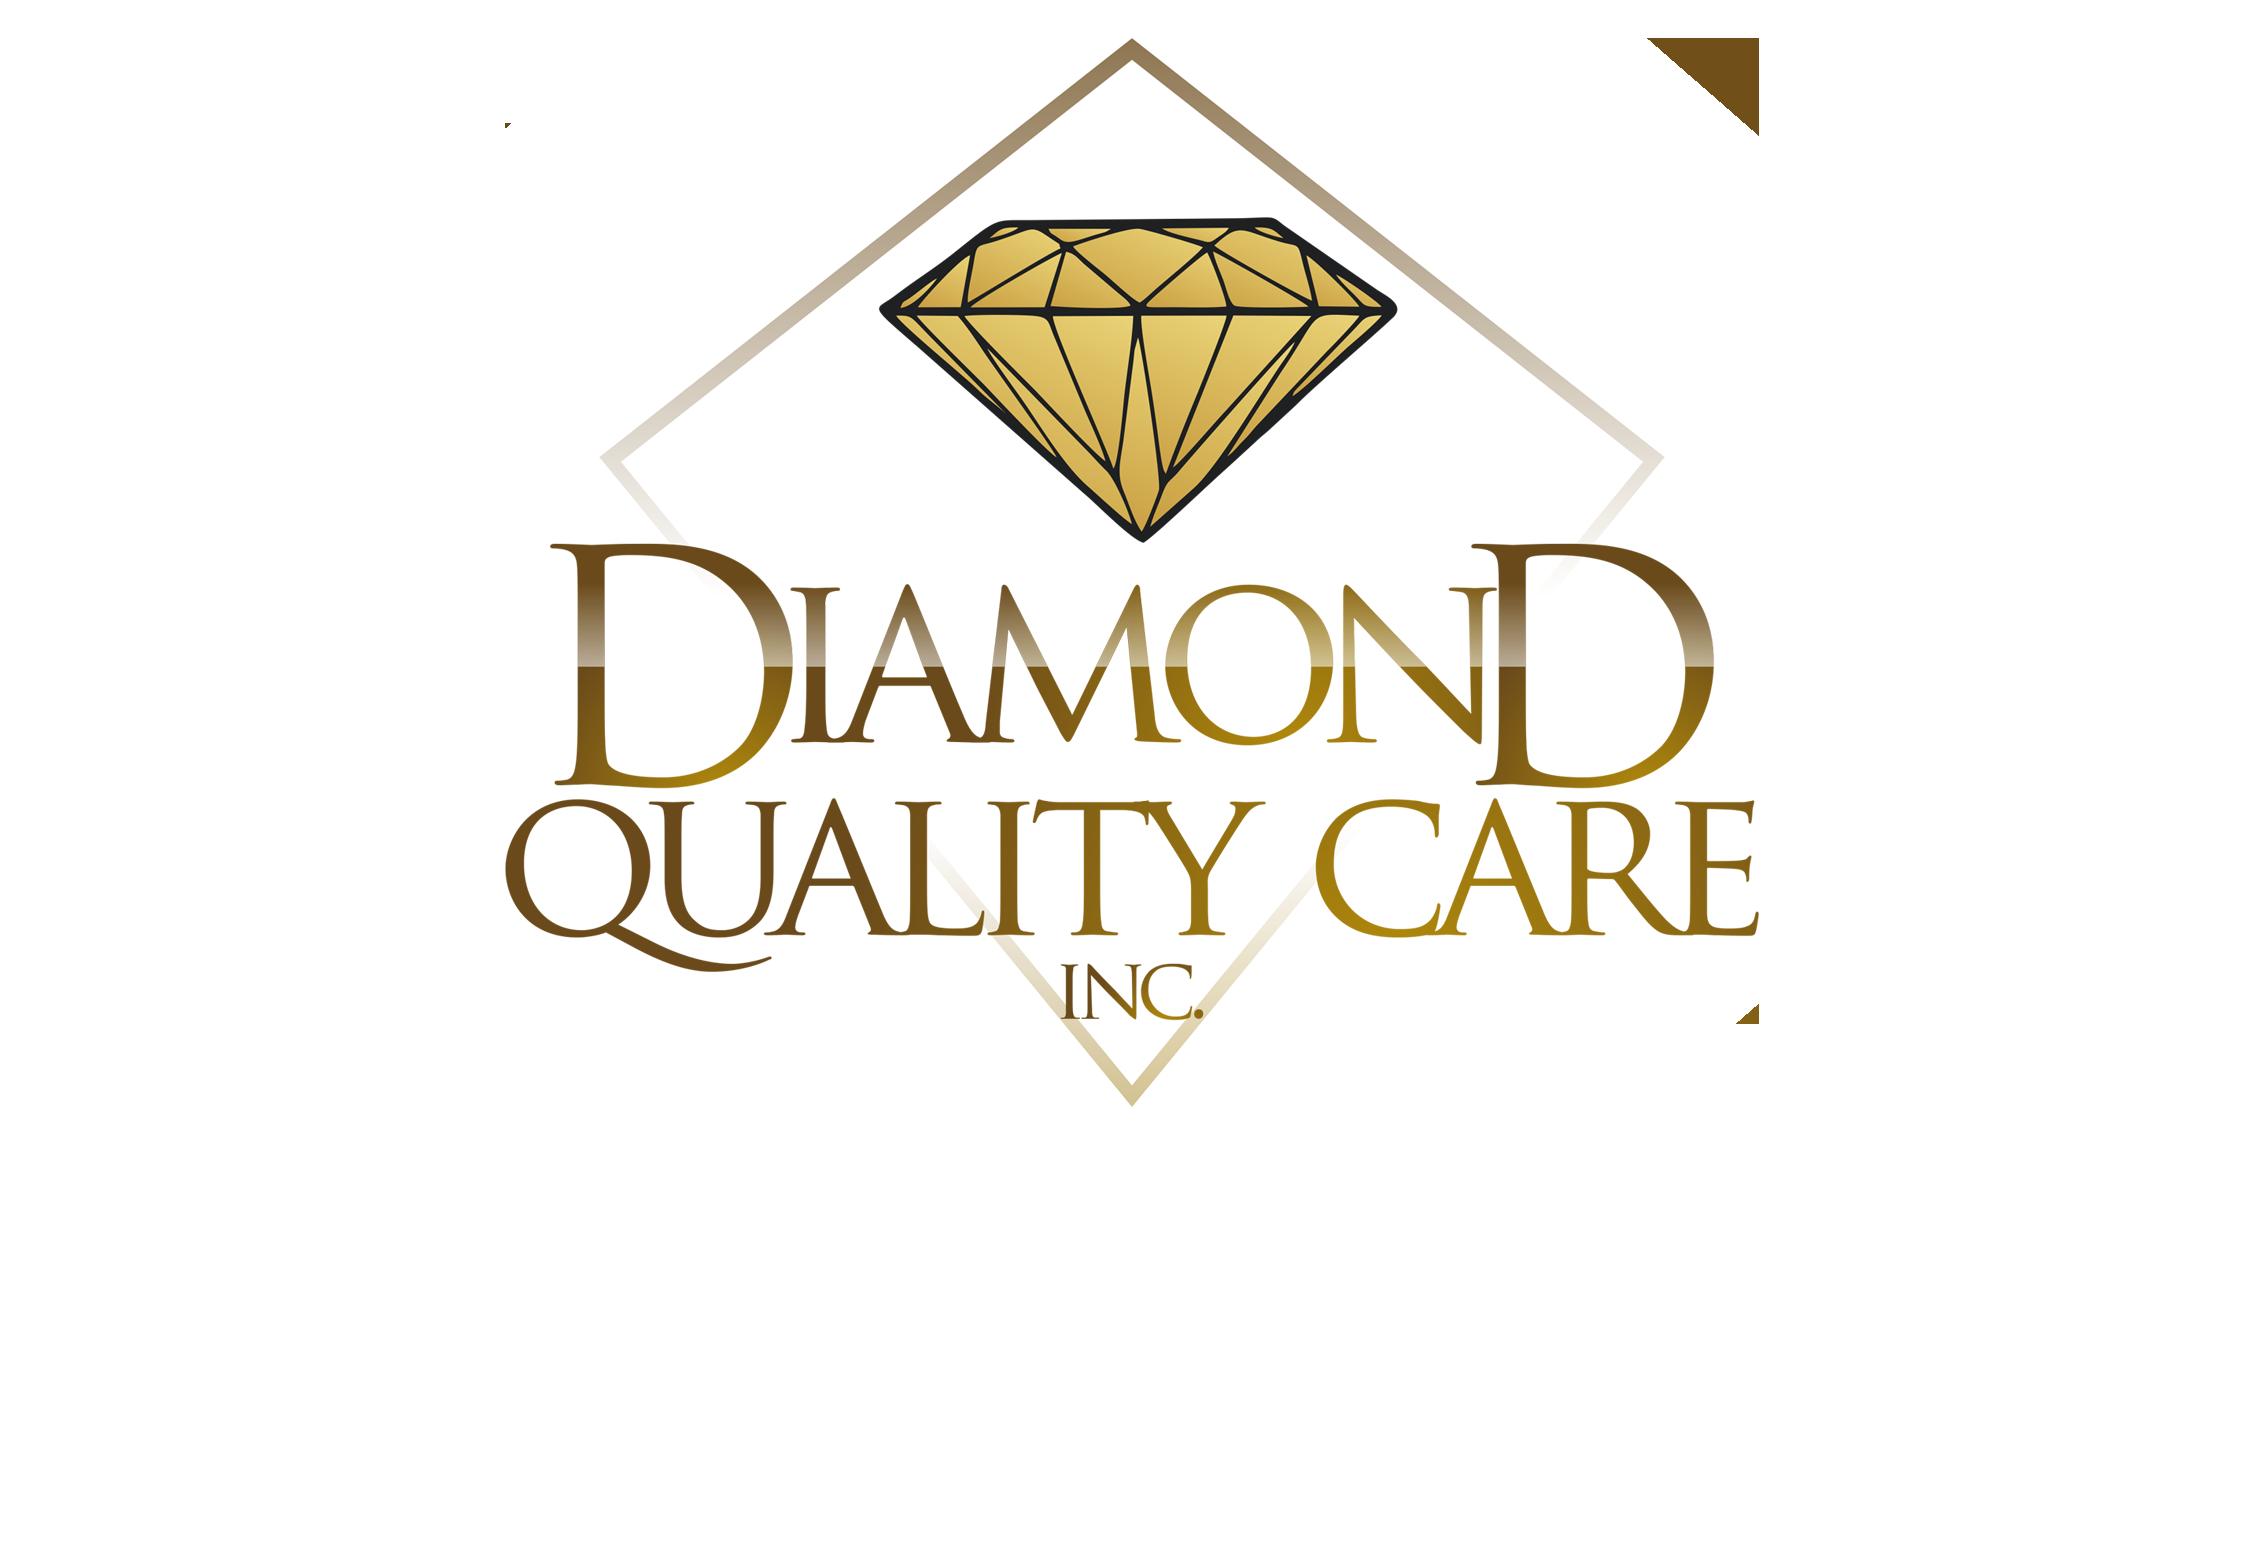 diamondqualitycareinc.com